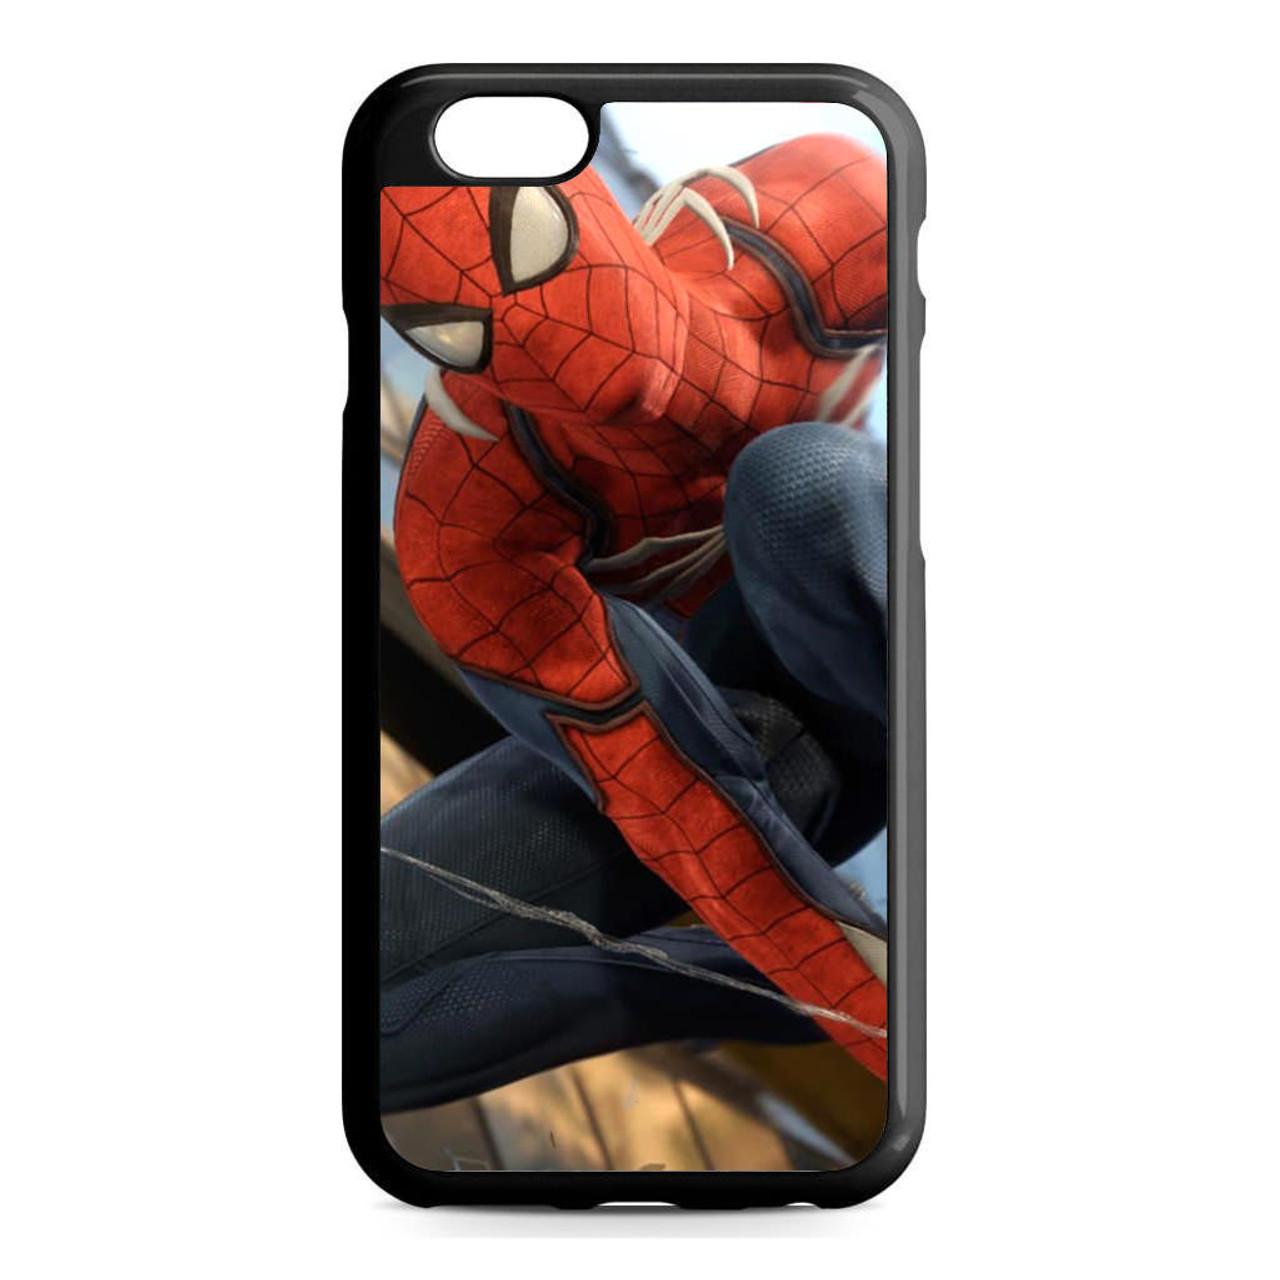 spiderman case iphone 6